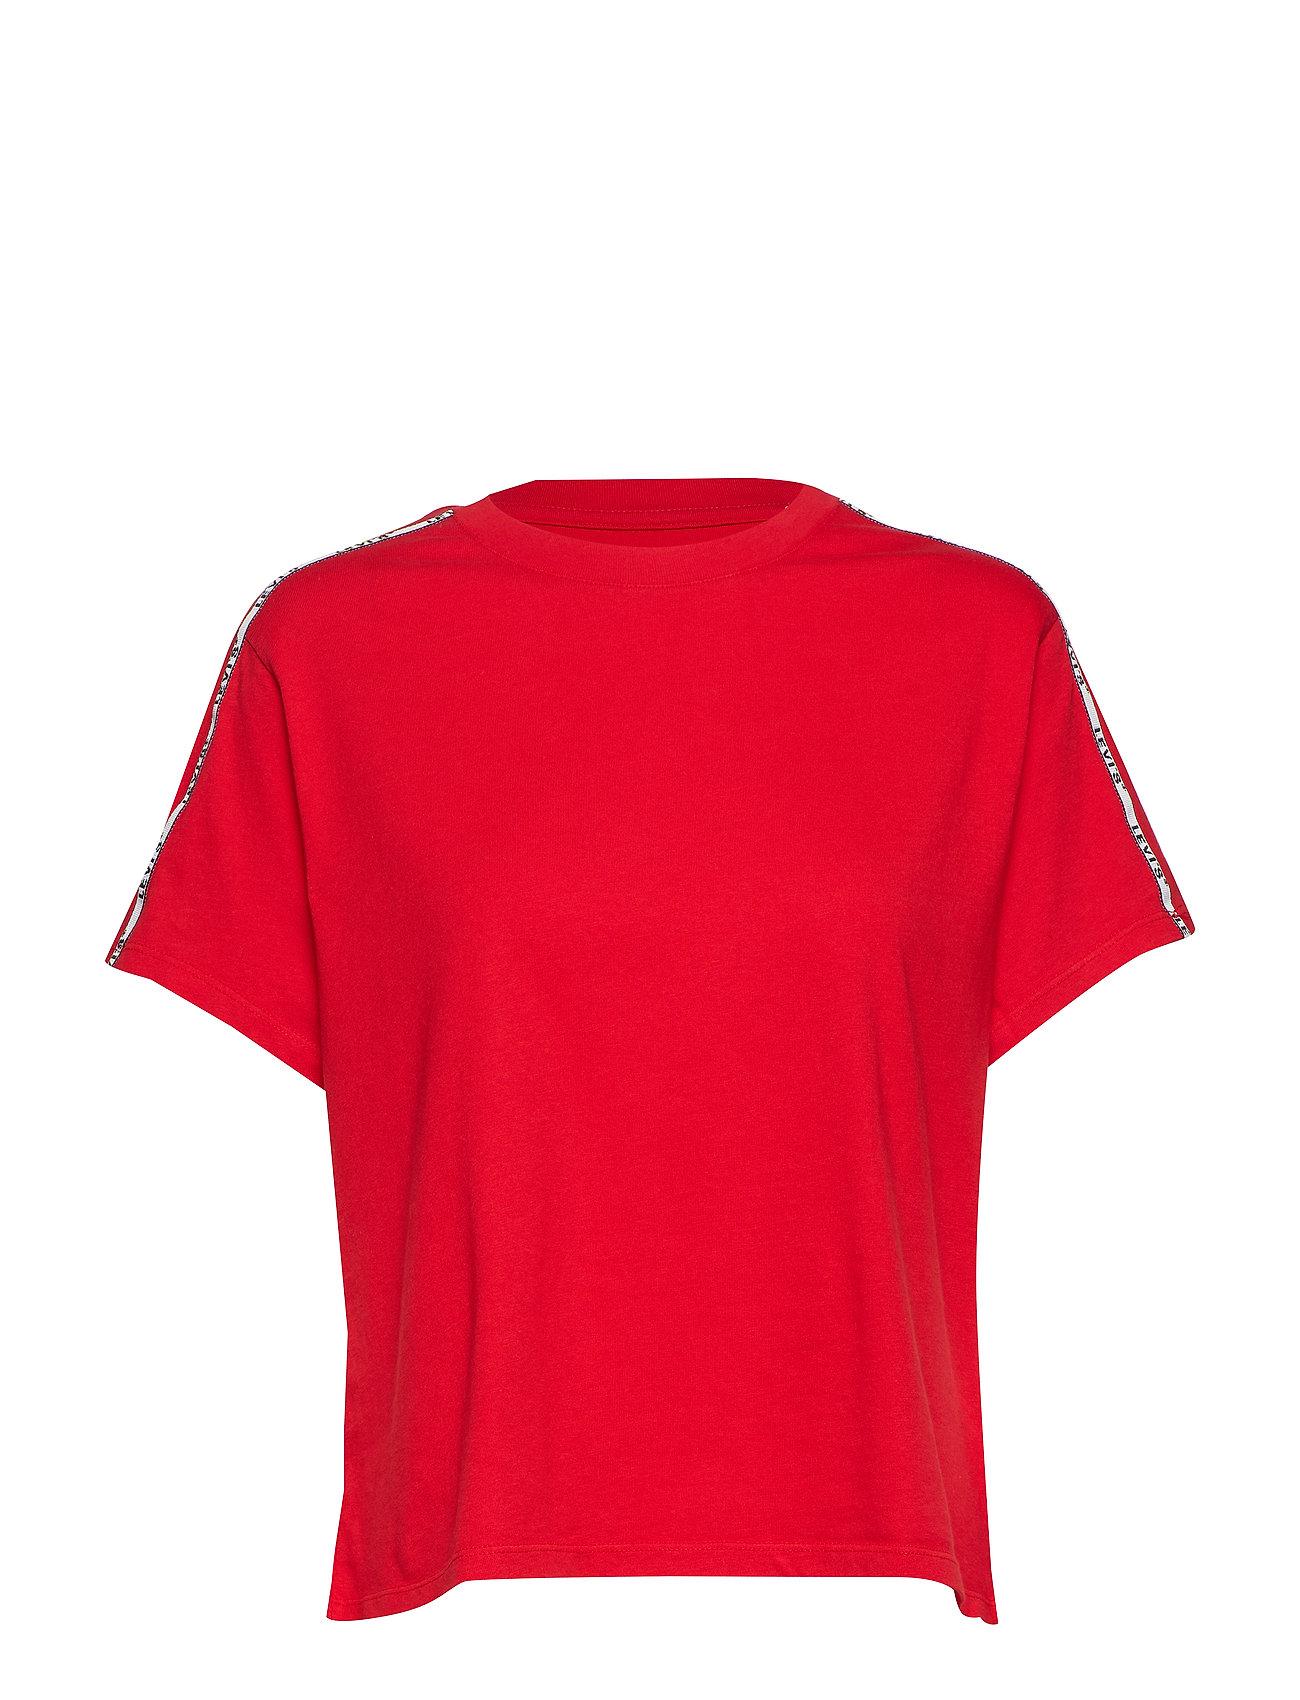 LEVI´S Women VARSITY TEE BRILLIANT RED - REDS